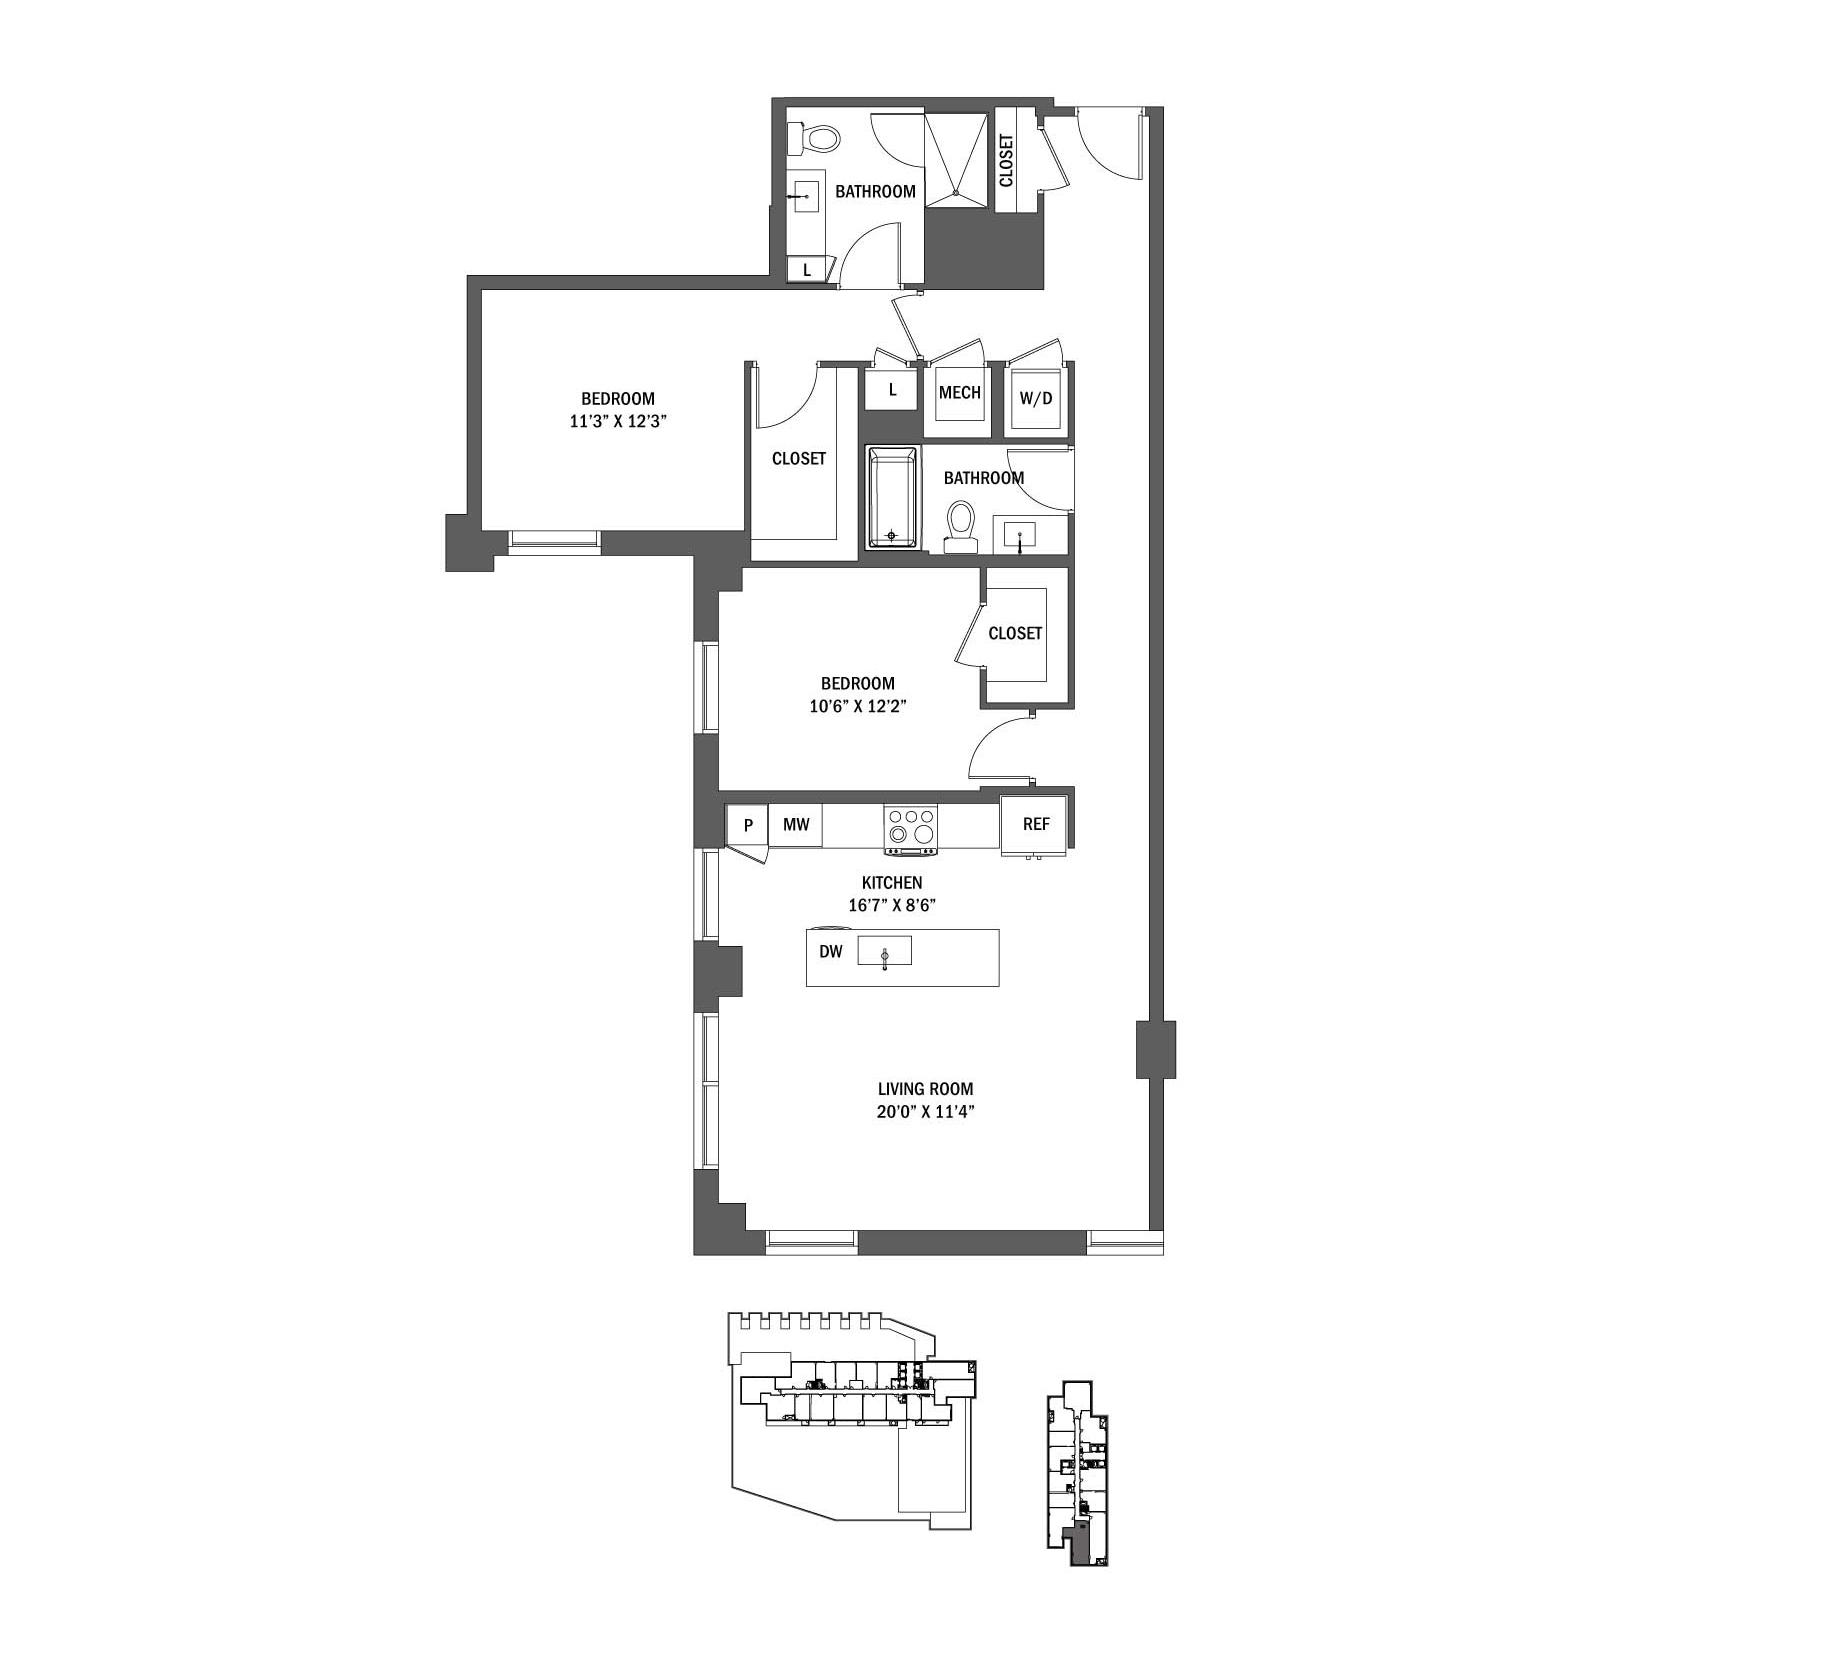 P0625338 789bc15 e09 18p 2 floorplan